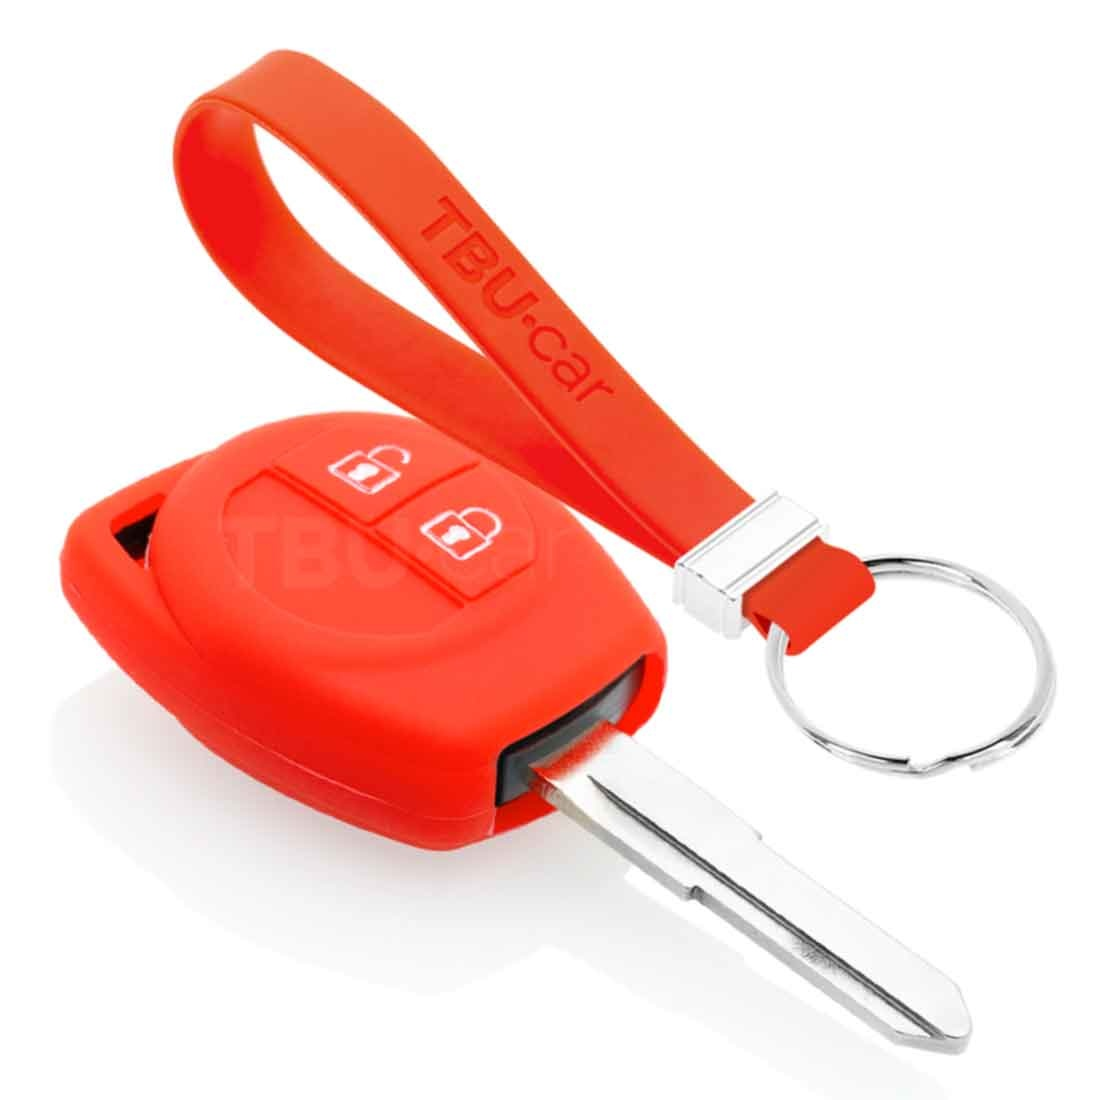 TBU car TBU car Sleutel cover compatibel met Suzuki - Silicone sleutelhoesje - beschermhoesje autosleutel - Rood